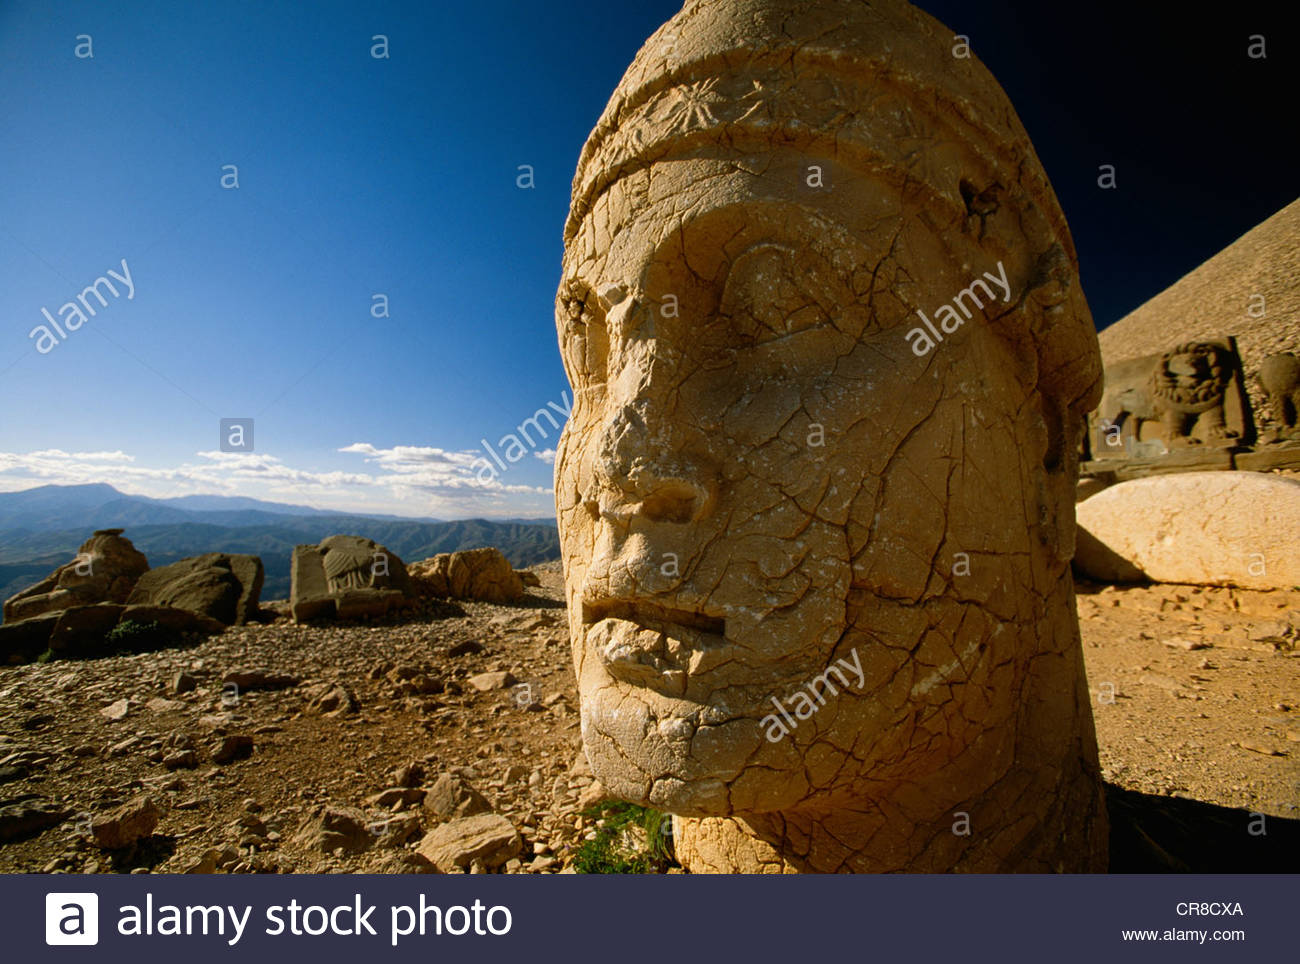 Mausoleum of Antiochus I (69-34 BC), Nemrut Dag Mountain, Kurd Region, Turkey - Stock Image